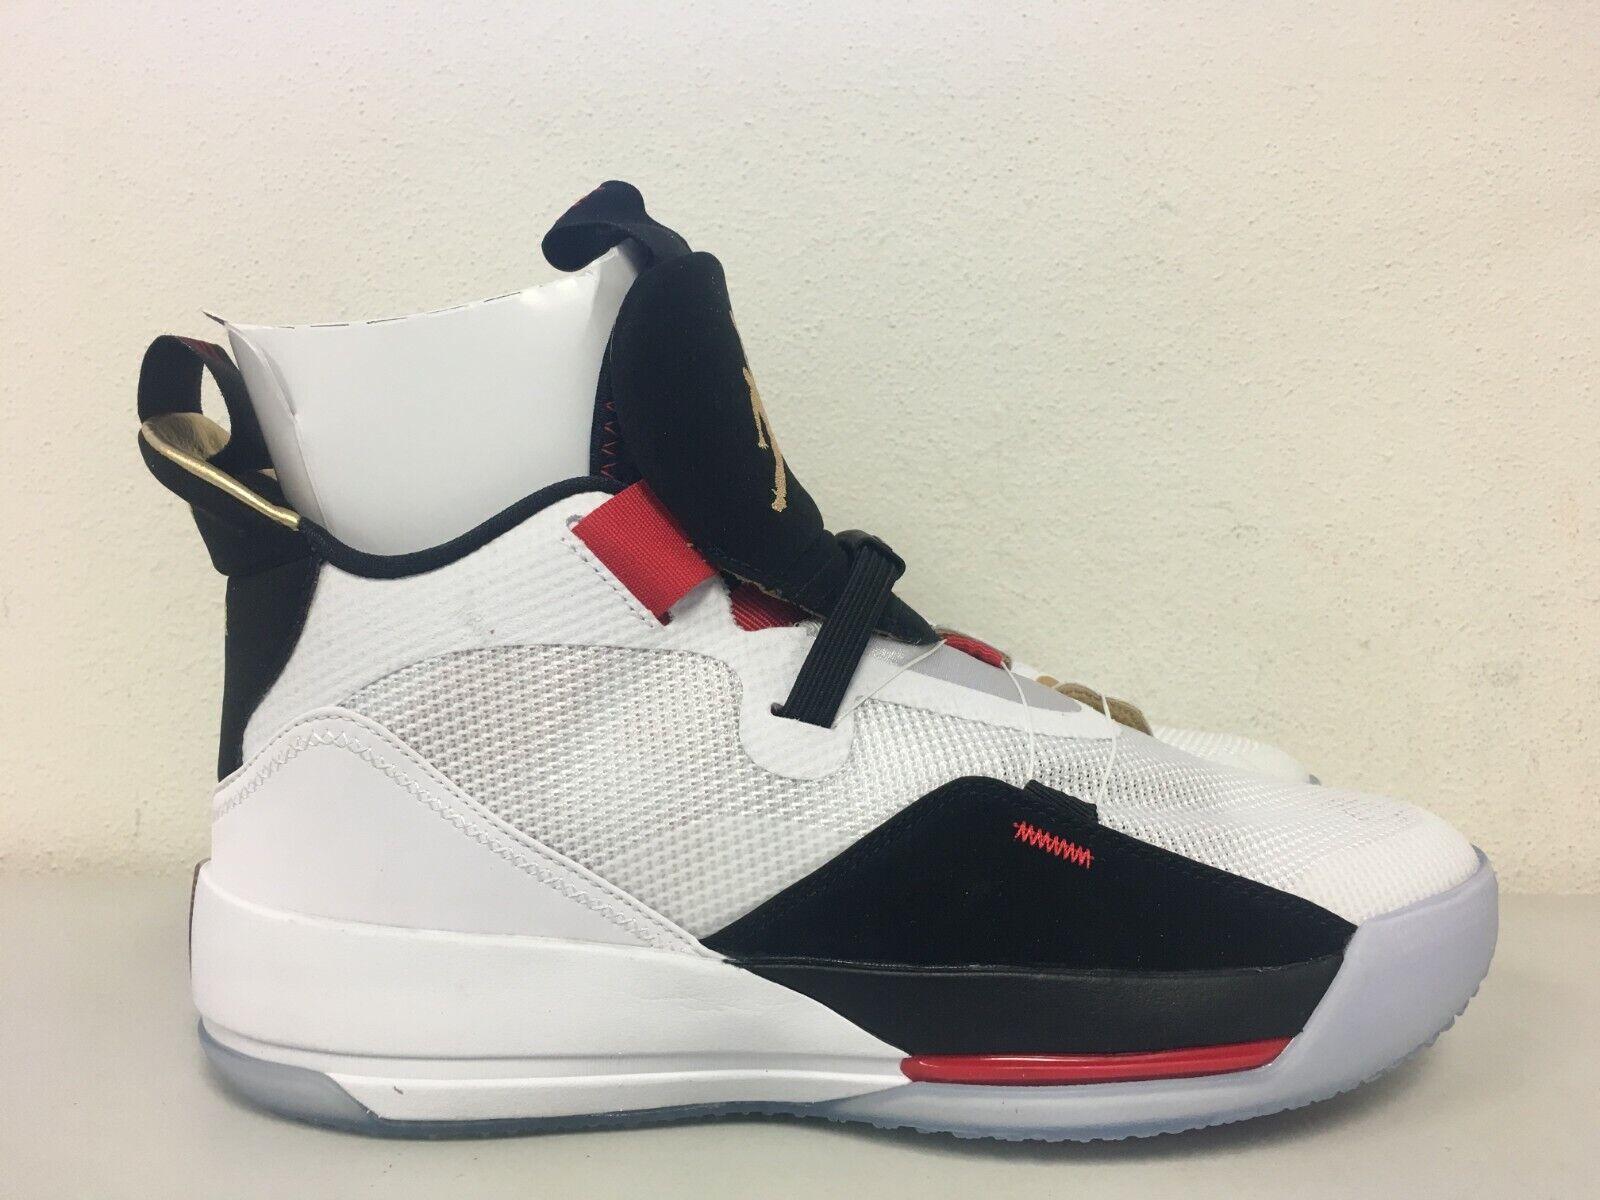 a17da006b23518 Nike Air Jordan 33 Future of Flight White Gold Black Aq8830 100 Mens ...